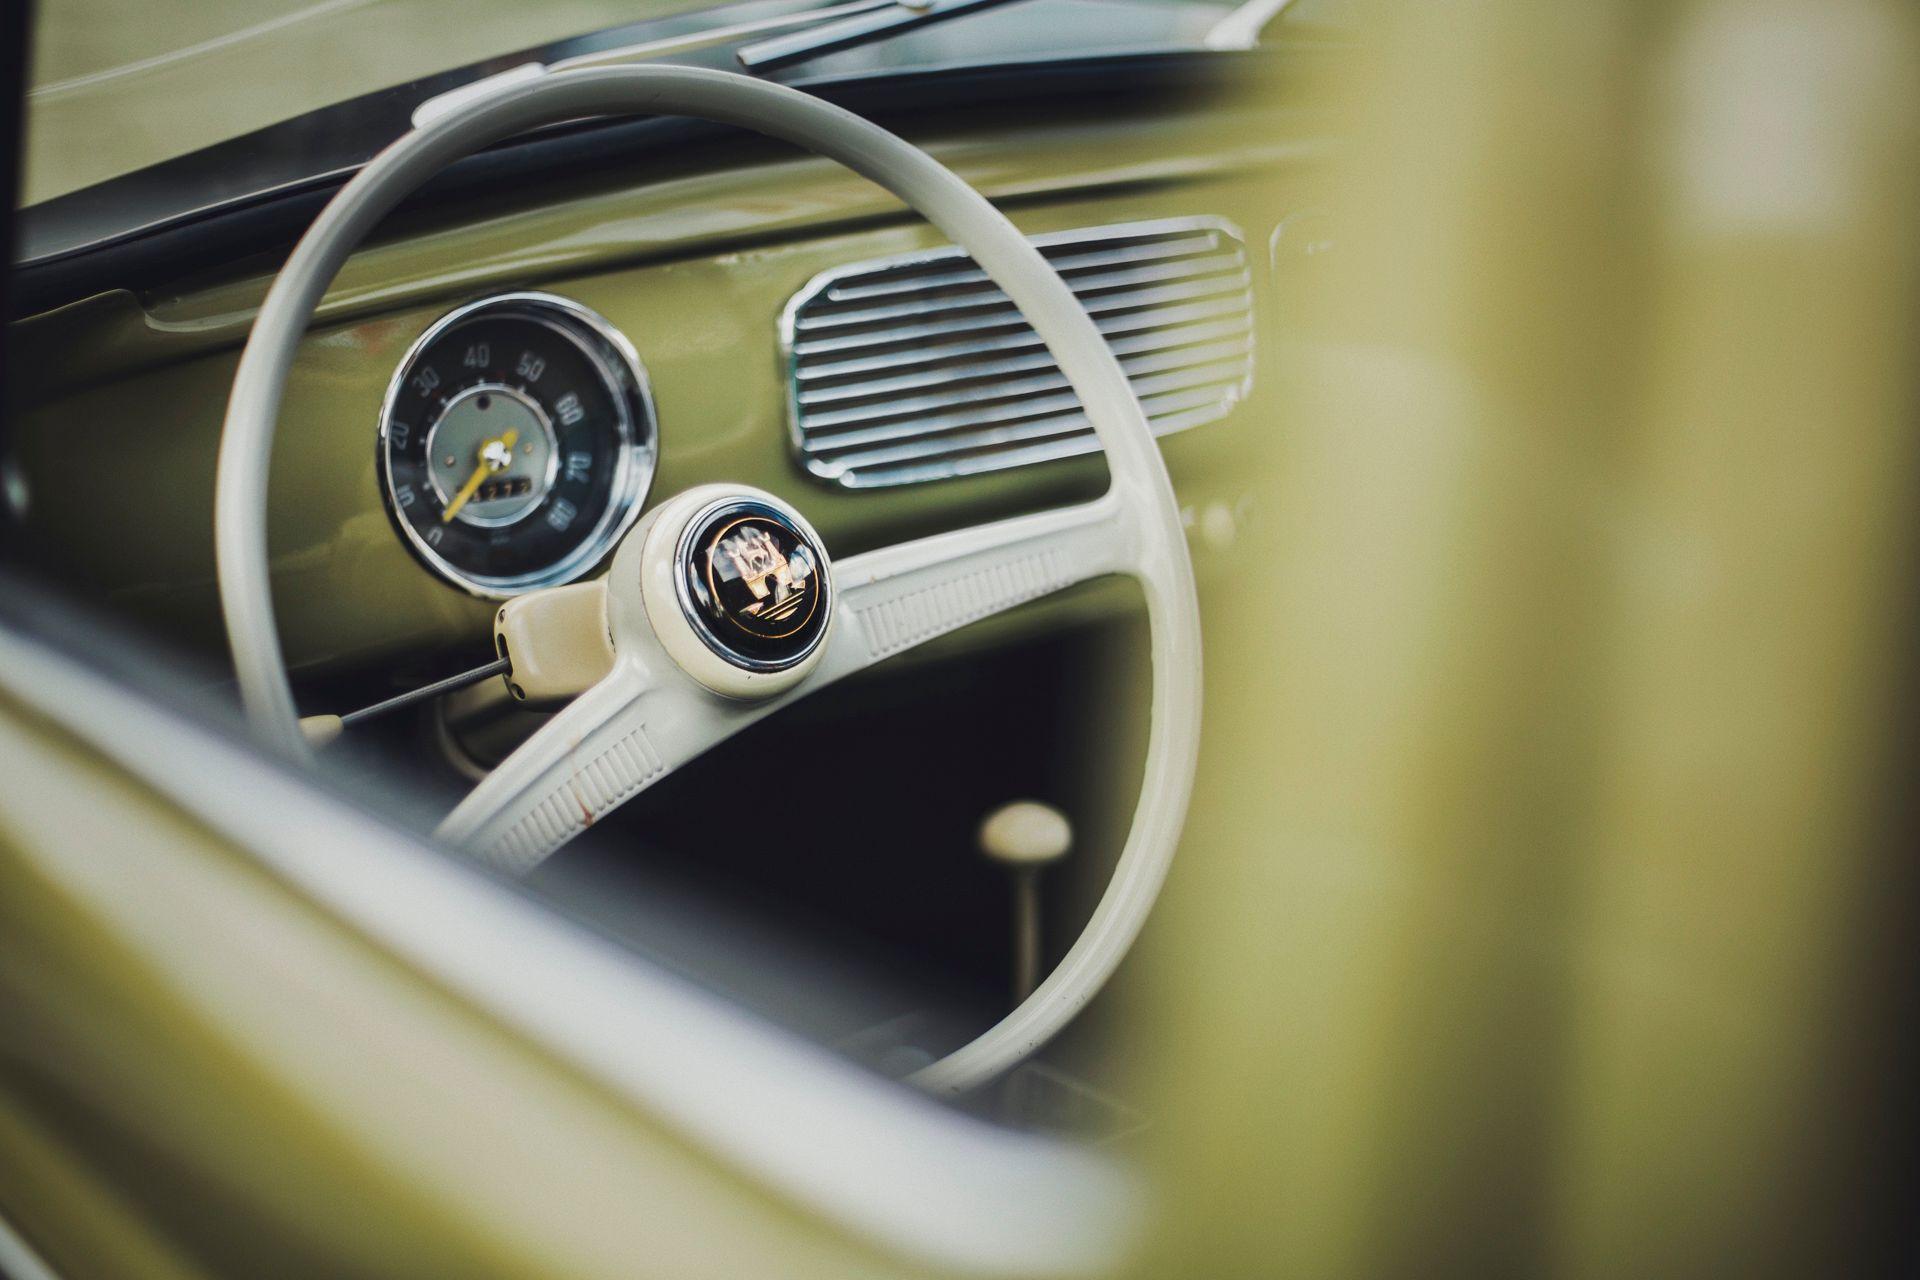 VW Beetle interior